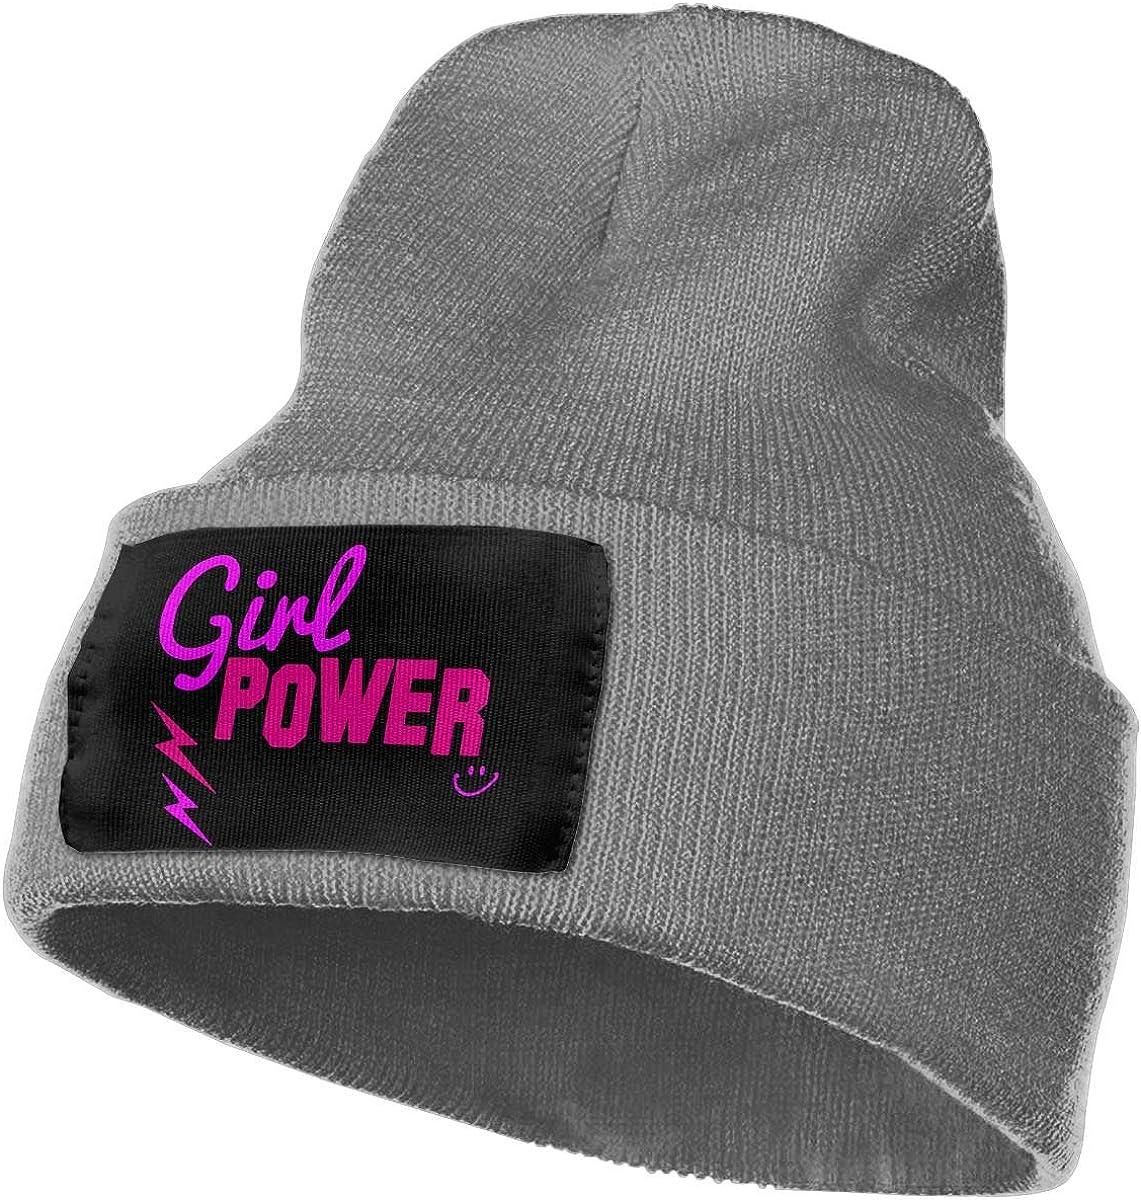 WHOO93@Y Mens Womens 100/% Acrylic Knitting Hat Cap Girl Power Fashion Beanie Hat